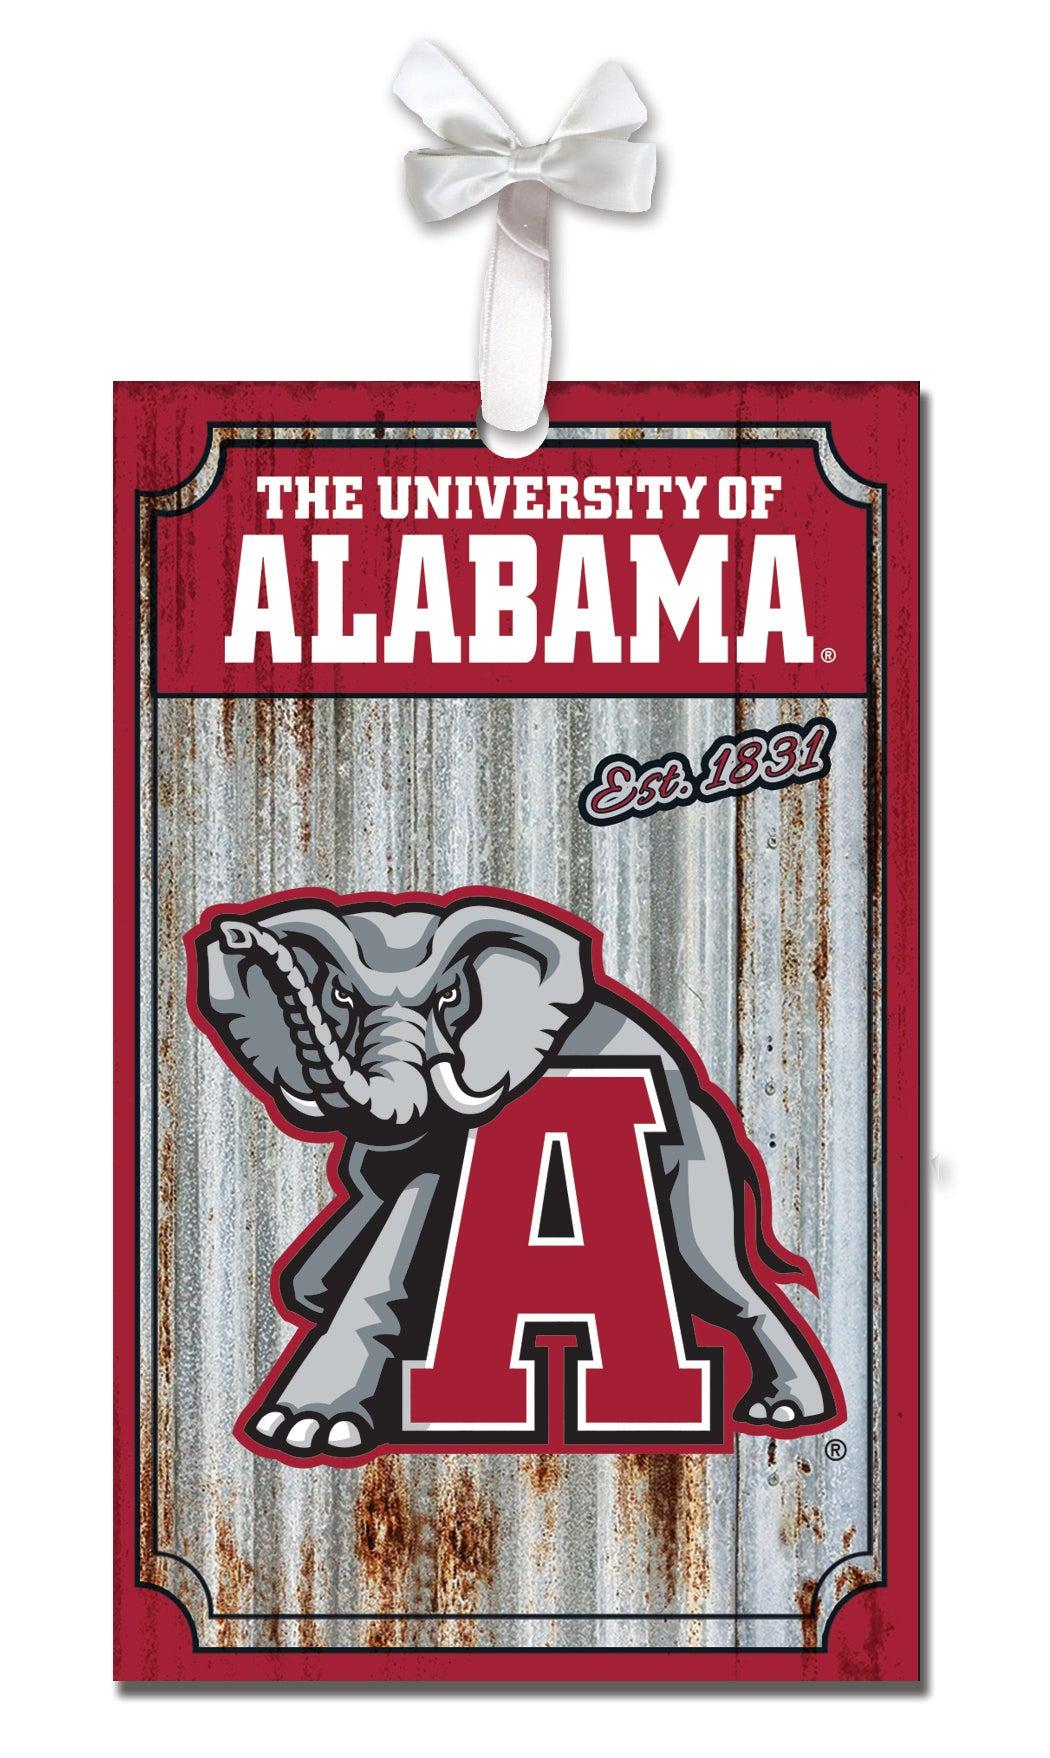 University of Alabama Corrugated Metal Ornament